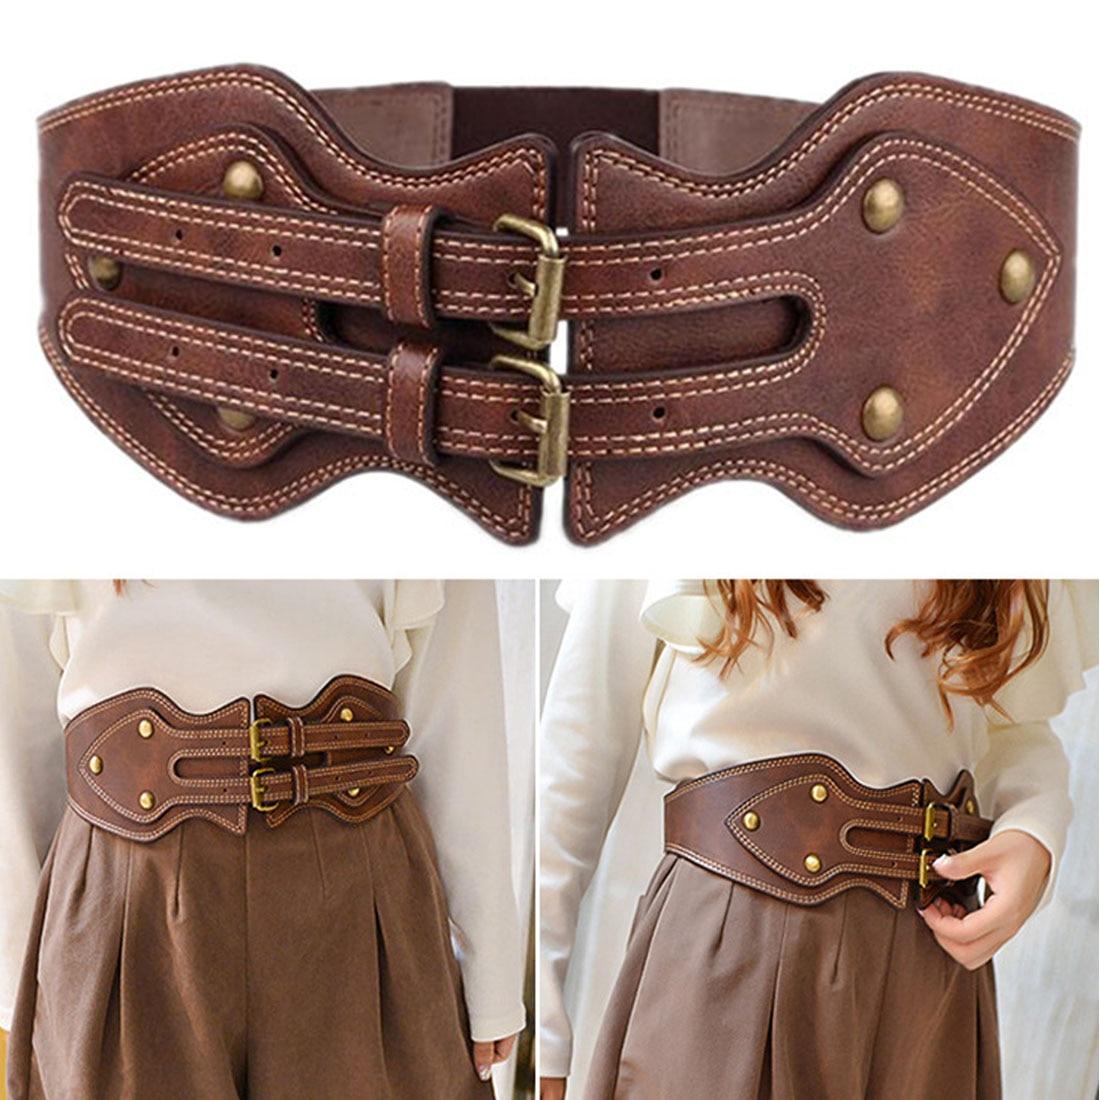 Women Vintage Genuine Leather Waistband Dual Metal Needle Buckle Stylish Elastic Wide Belt Cummerbund For Apparel Accessories